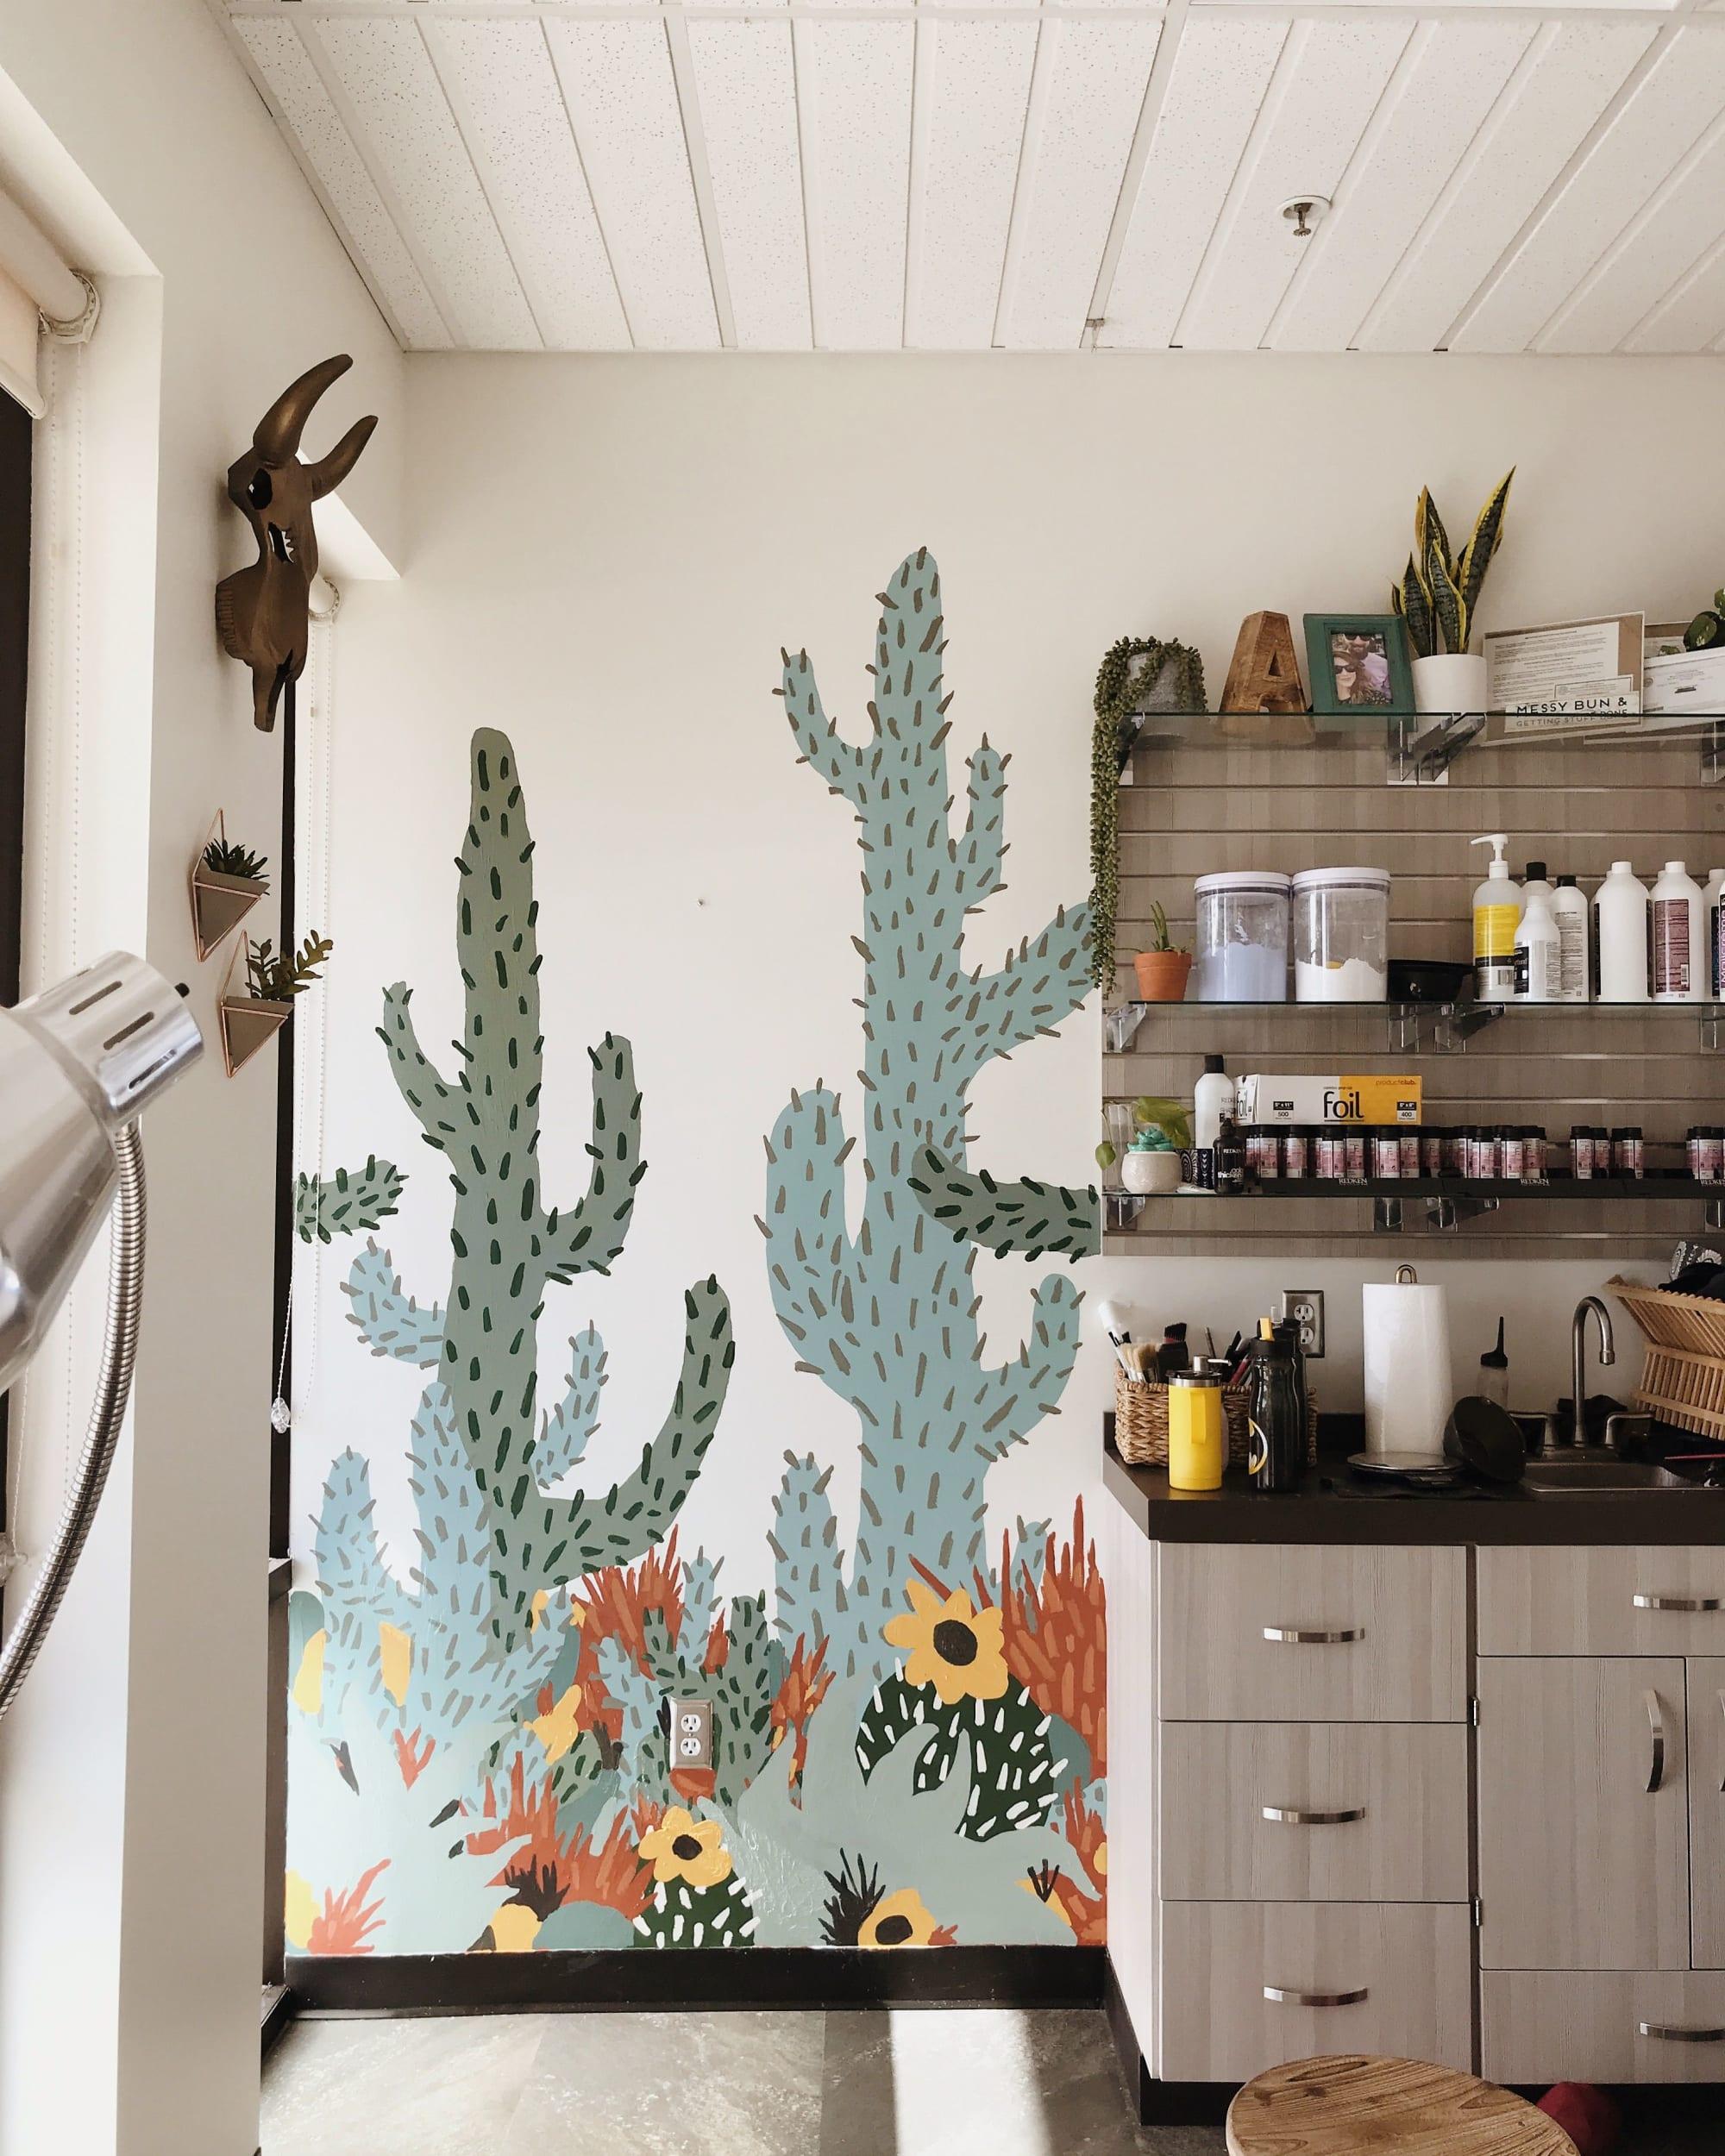 Desert Mural for Amberly Colina Salon Murals by The Small Creative, in Sola Salon Studios, Savannah, GA